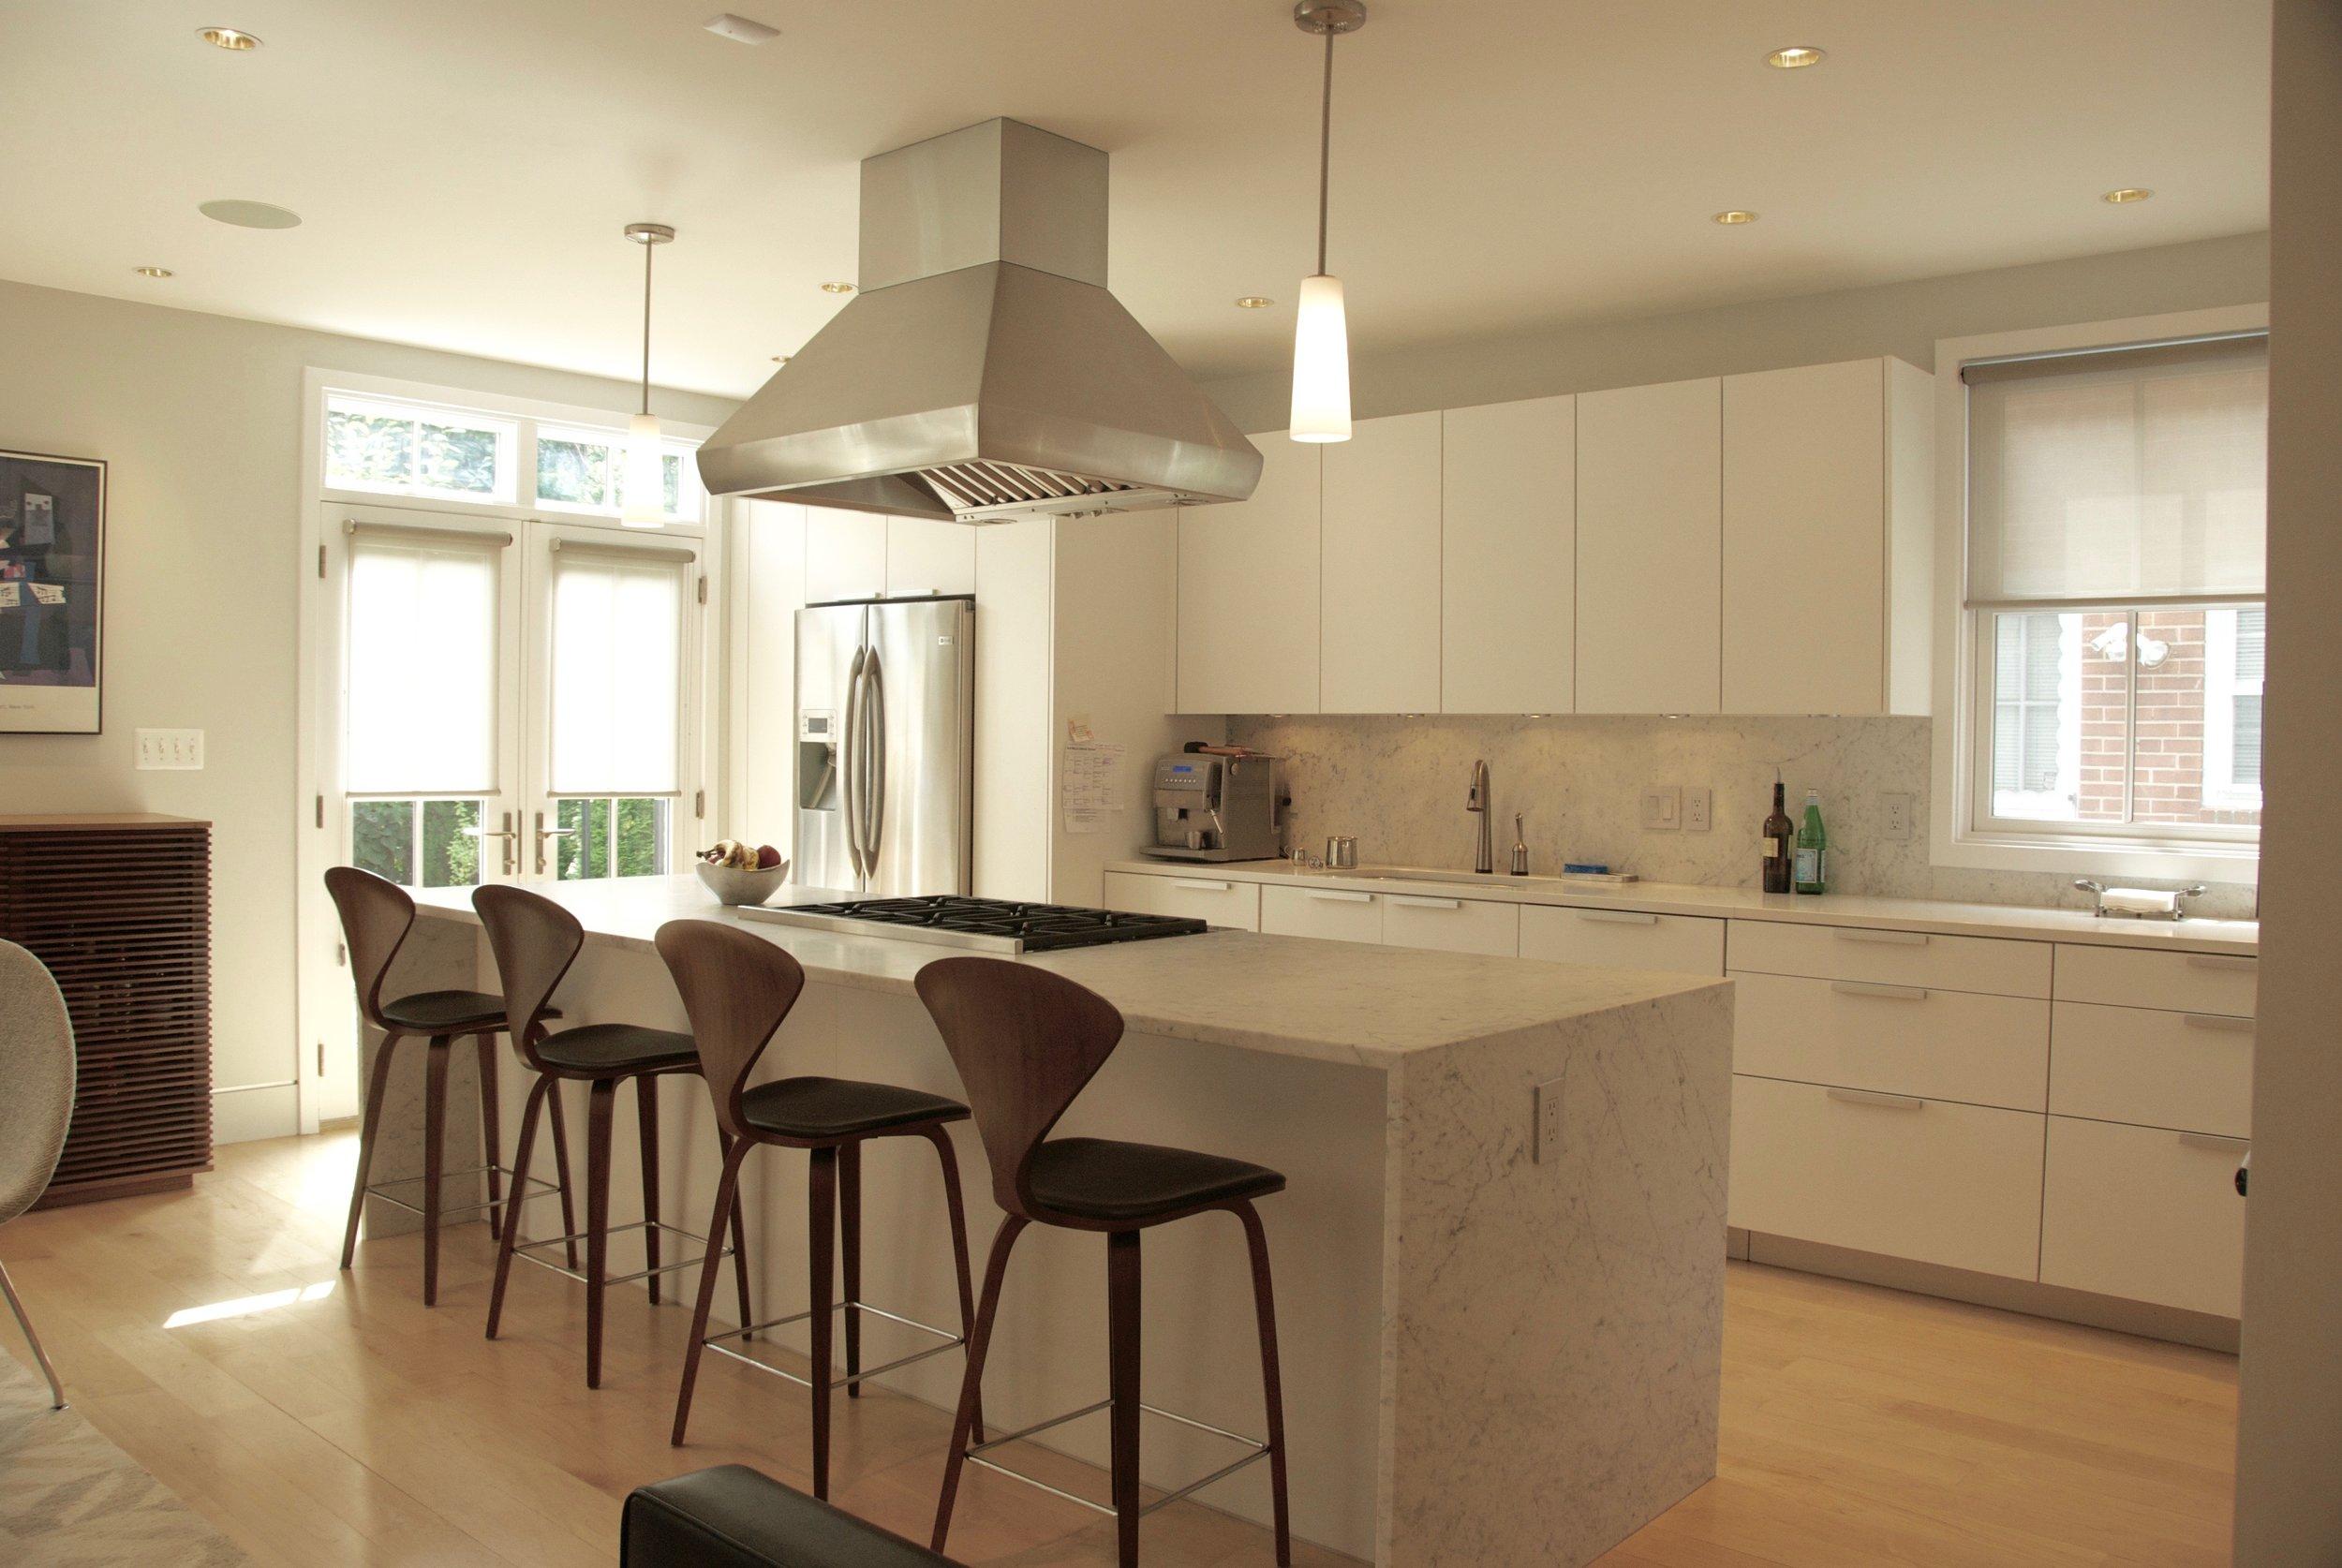 New Kitchen for New House in Alexandria, VA